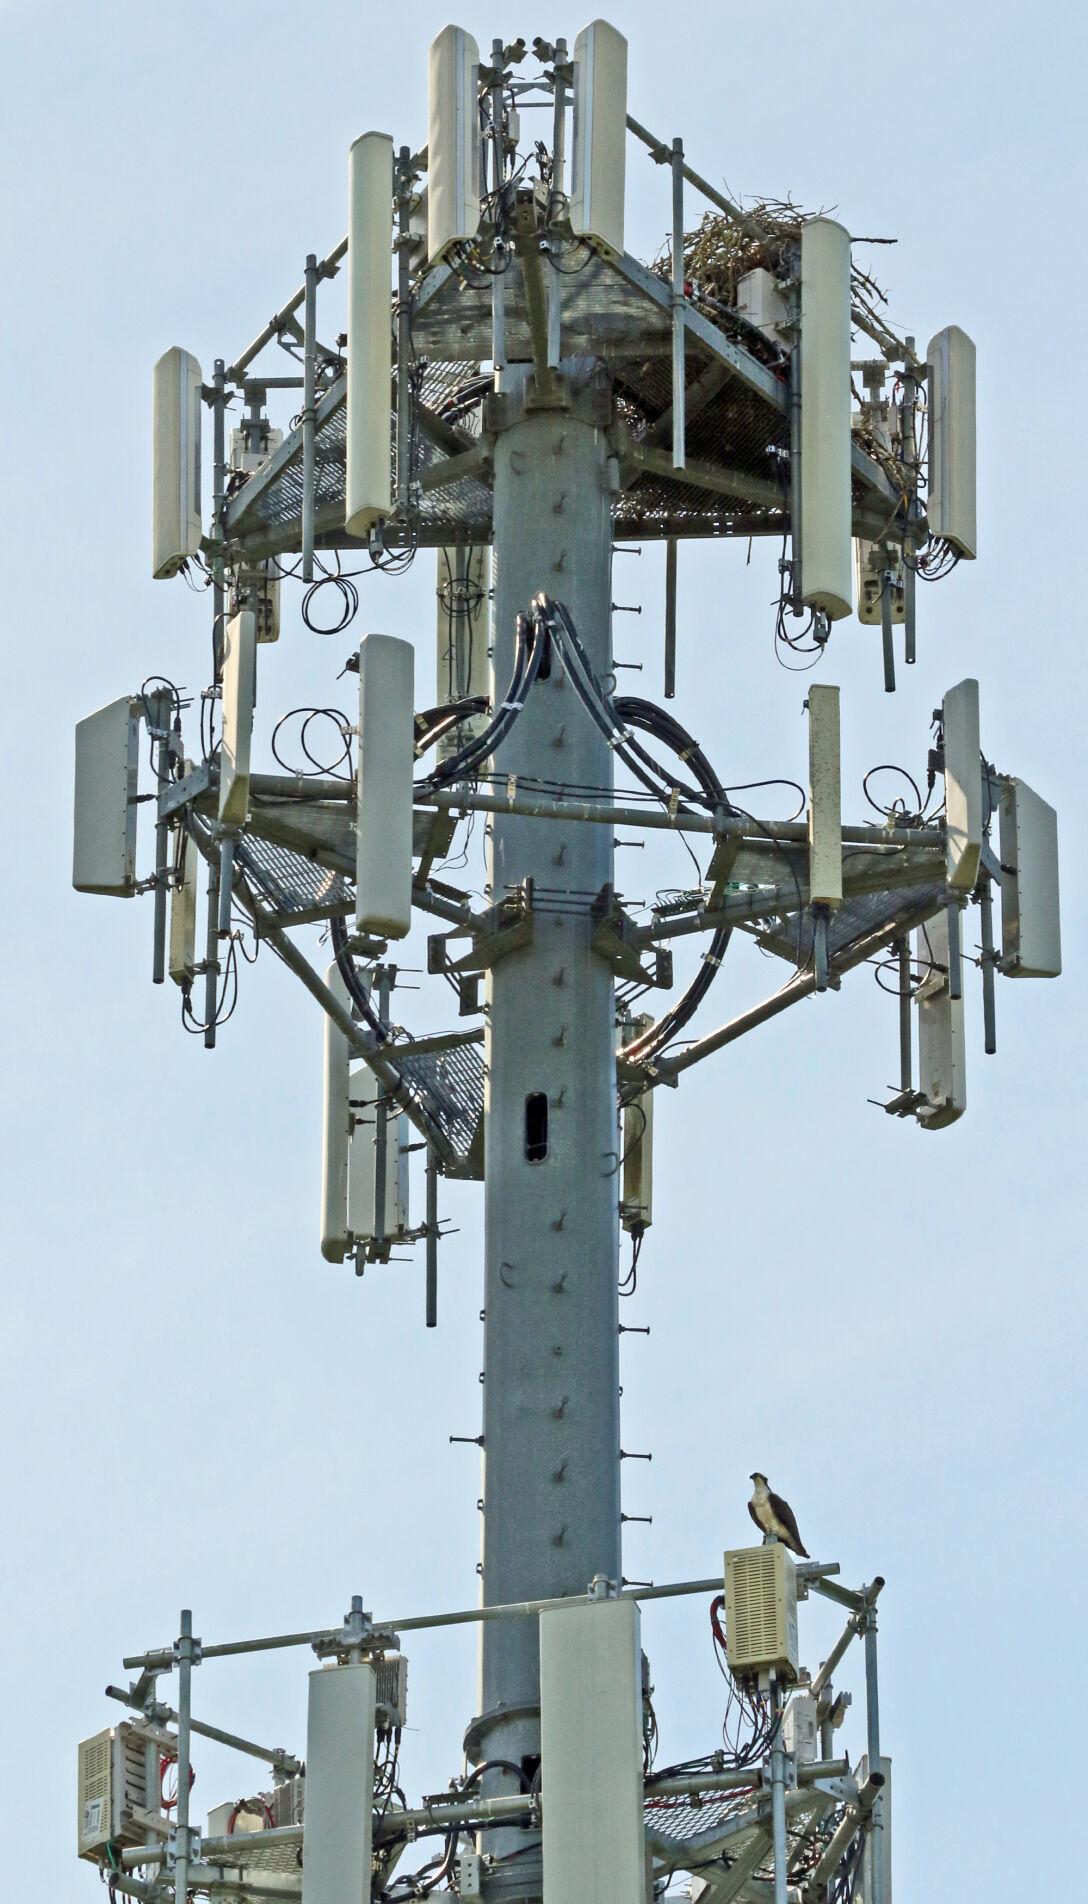 061021 NSTN Osprey nest on tower hh 53243.JPG